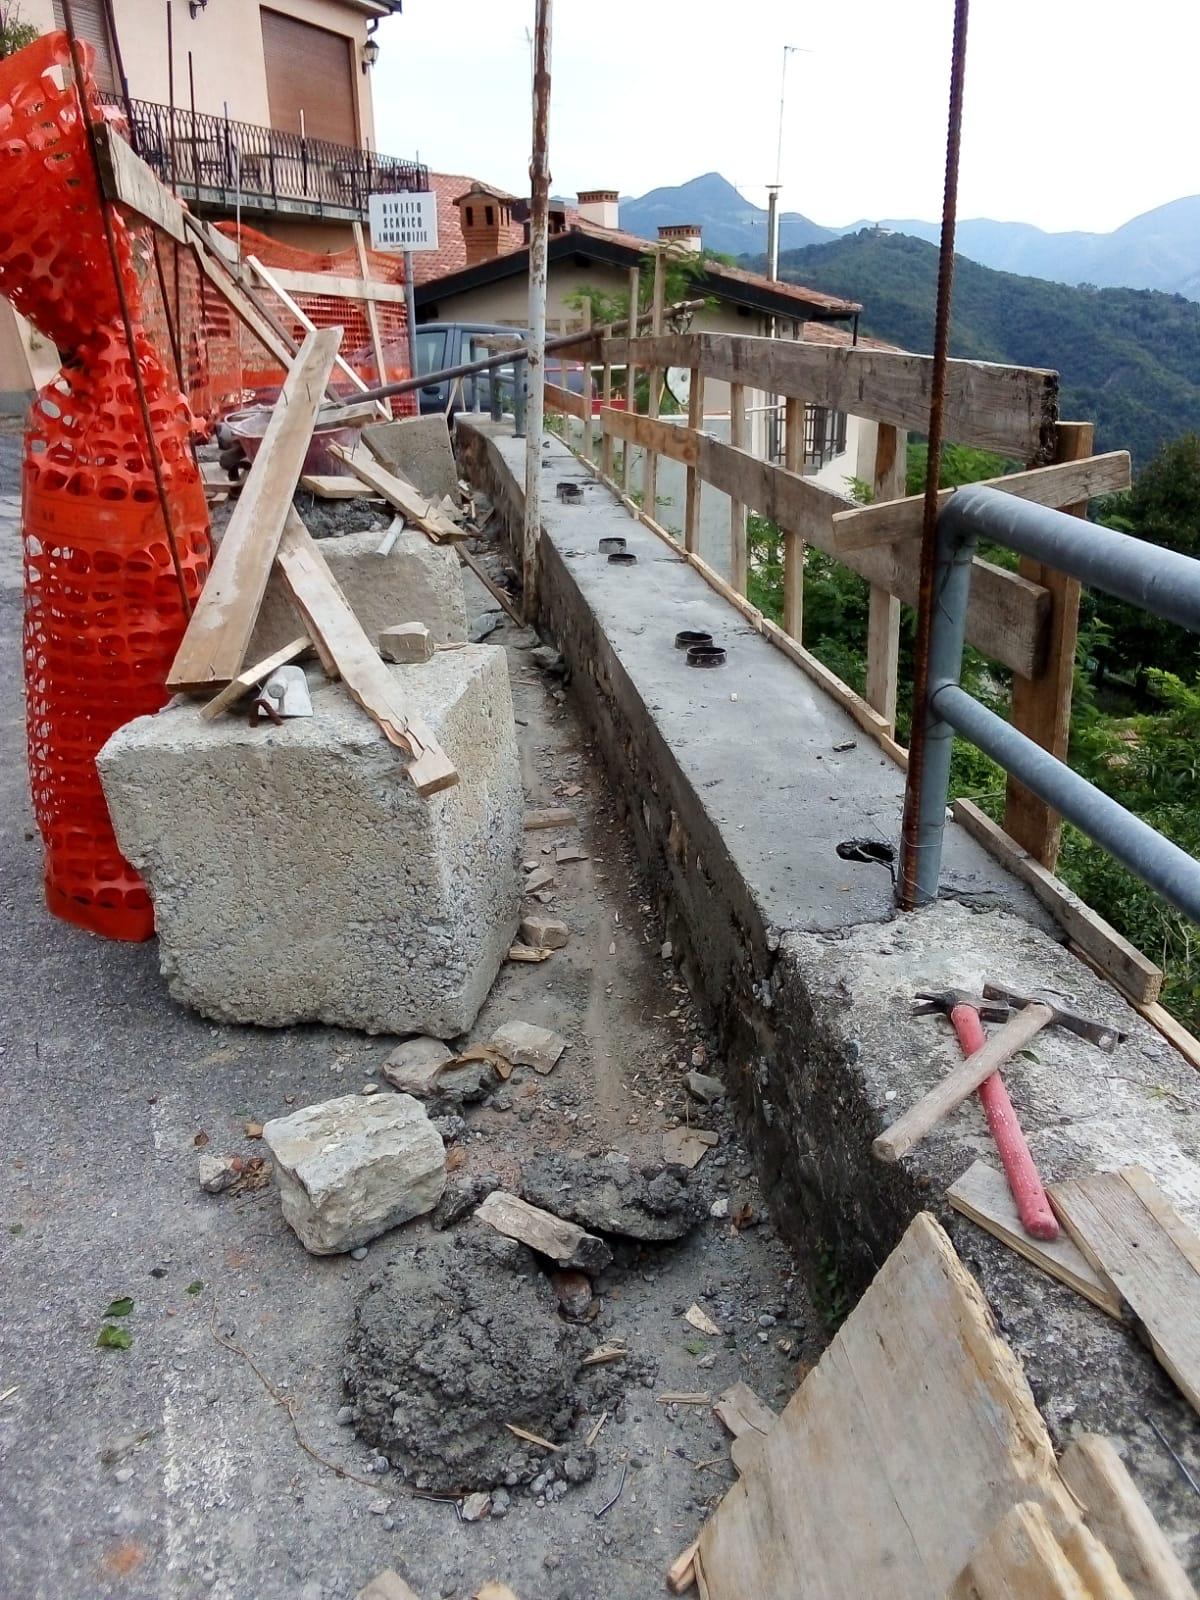 Ripristino arredo urbano post incidente Gandosso (Bergamo)